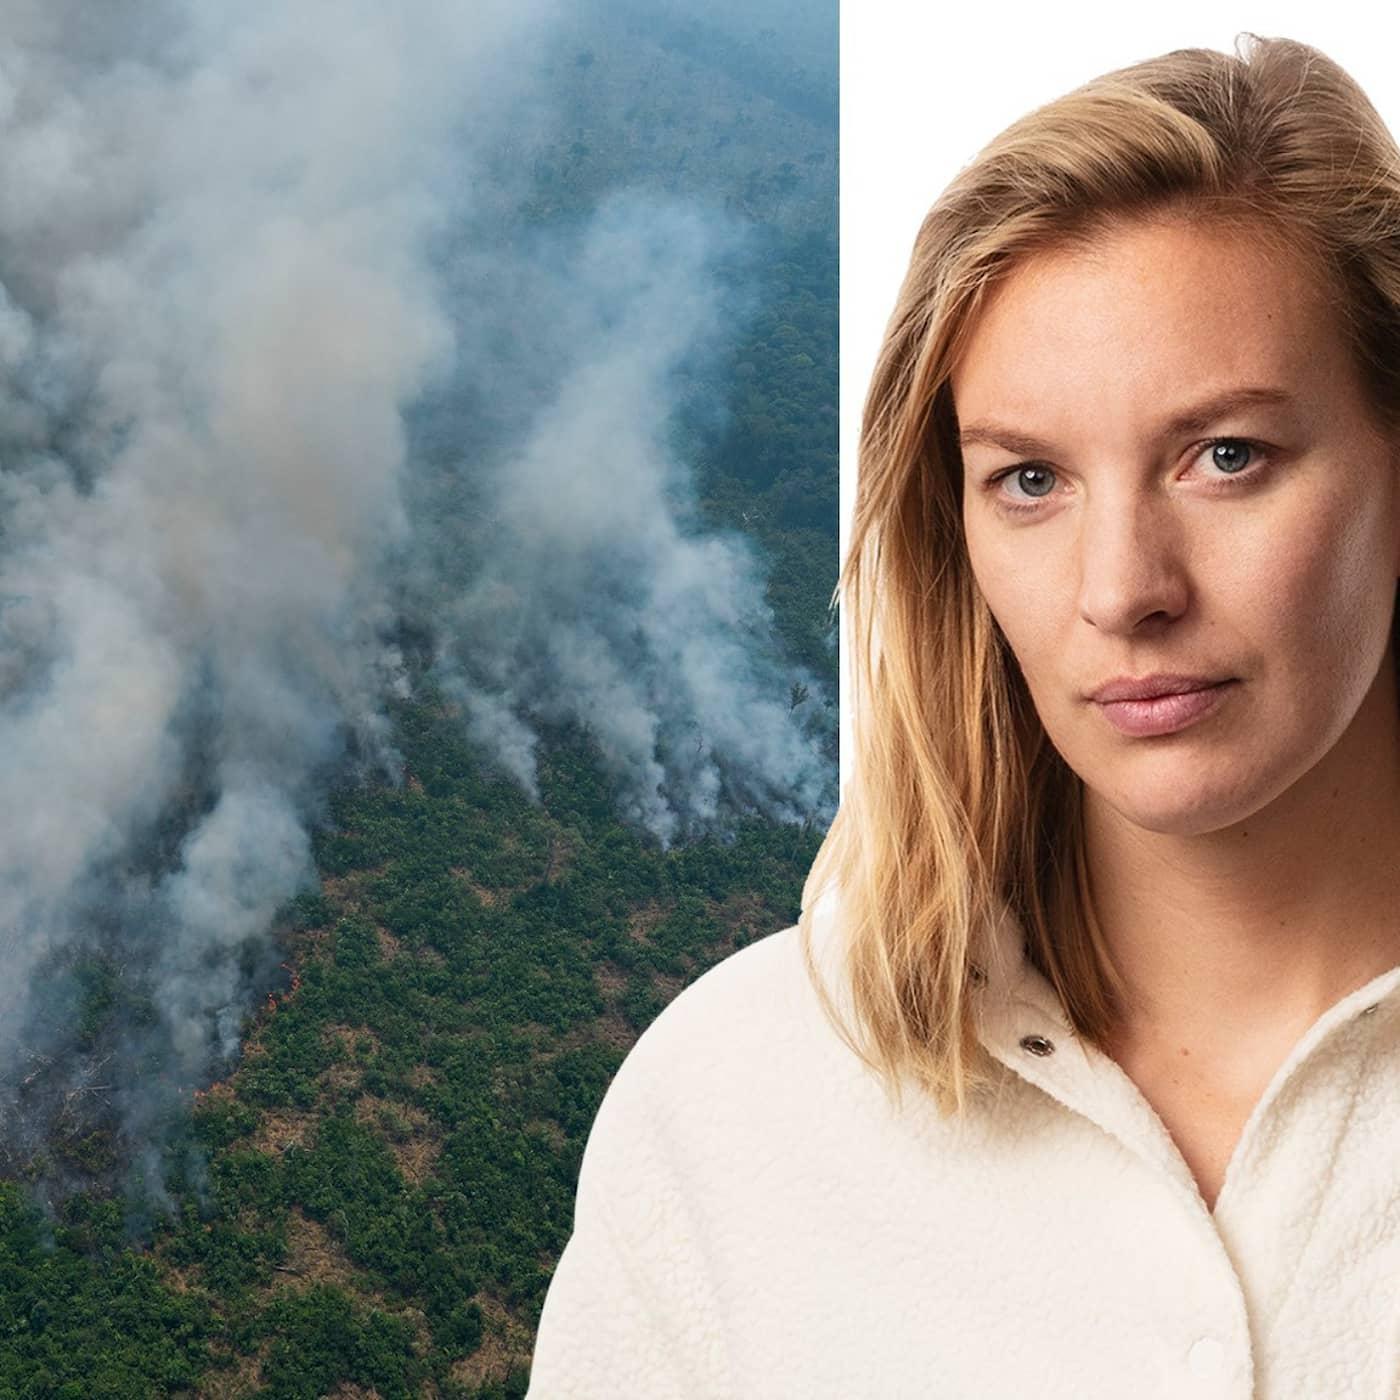 Bränderna i Amazonas ovanifrån: Sara Sundberg, Rio de Janeiro